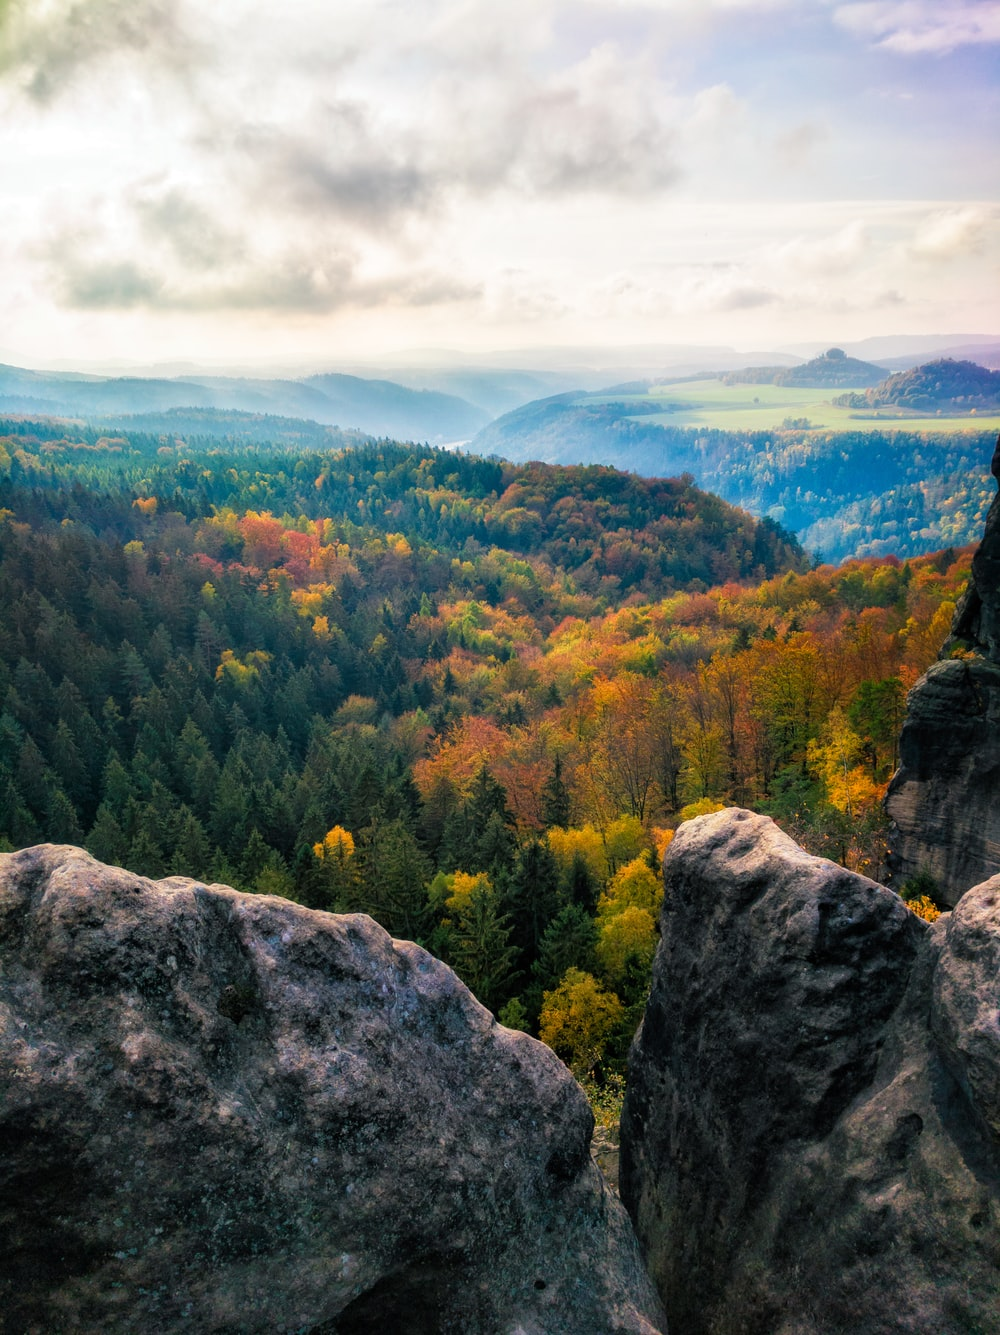 gray rocks and trees